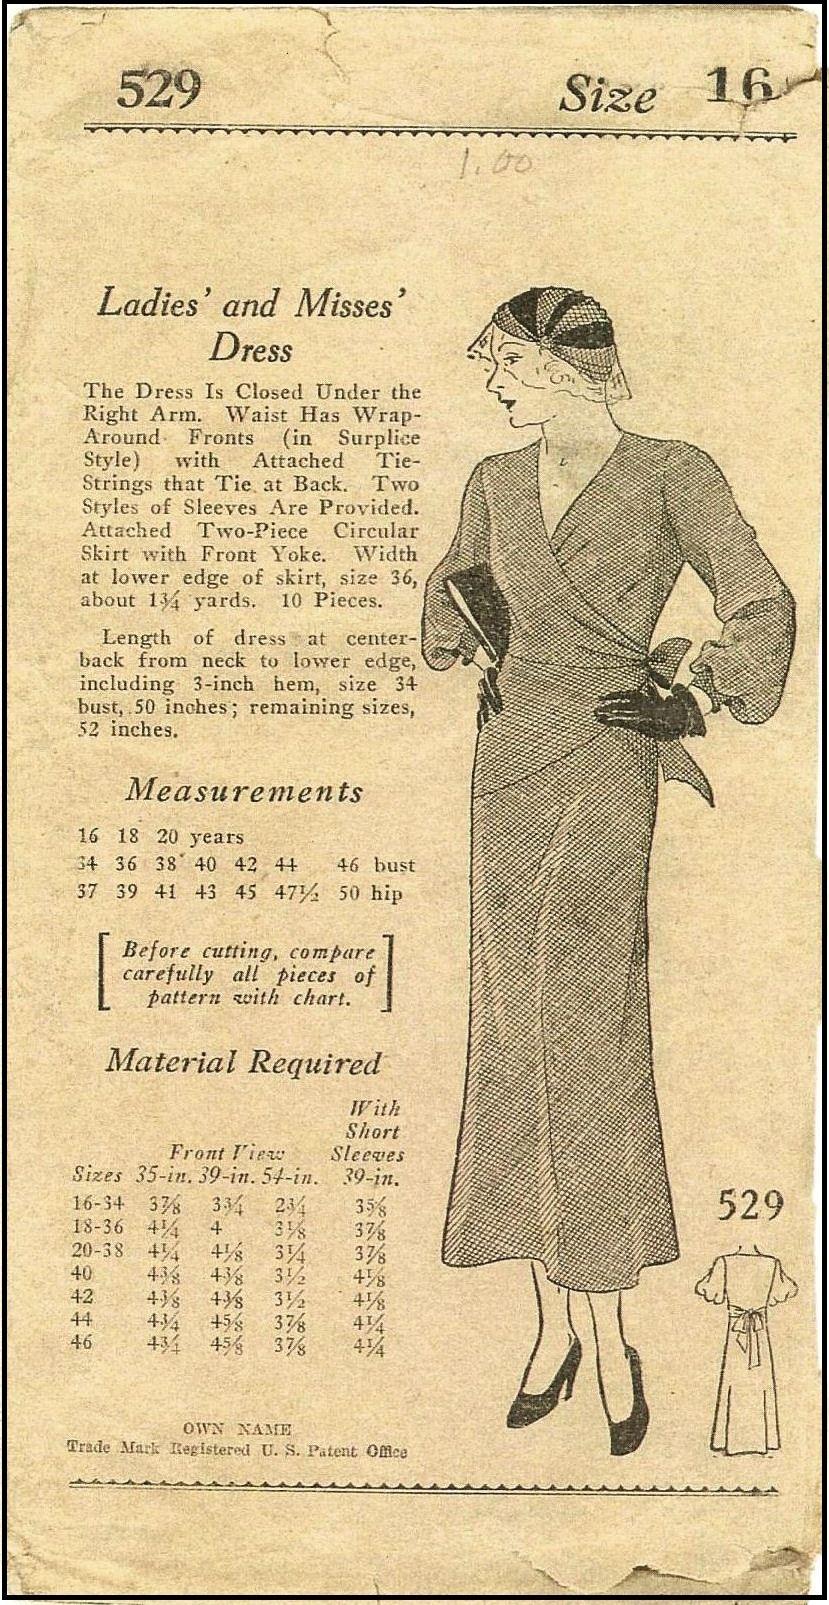 1930s Ladies Wrap Dress Sewing Pattern Mail Order Unknown 529 In 2021 Vintage Patterns Vintage Pattern Wrap Dress Sewing Patterns [ 1605 x 829 Pixel ]